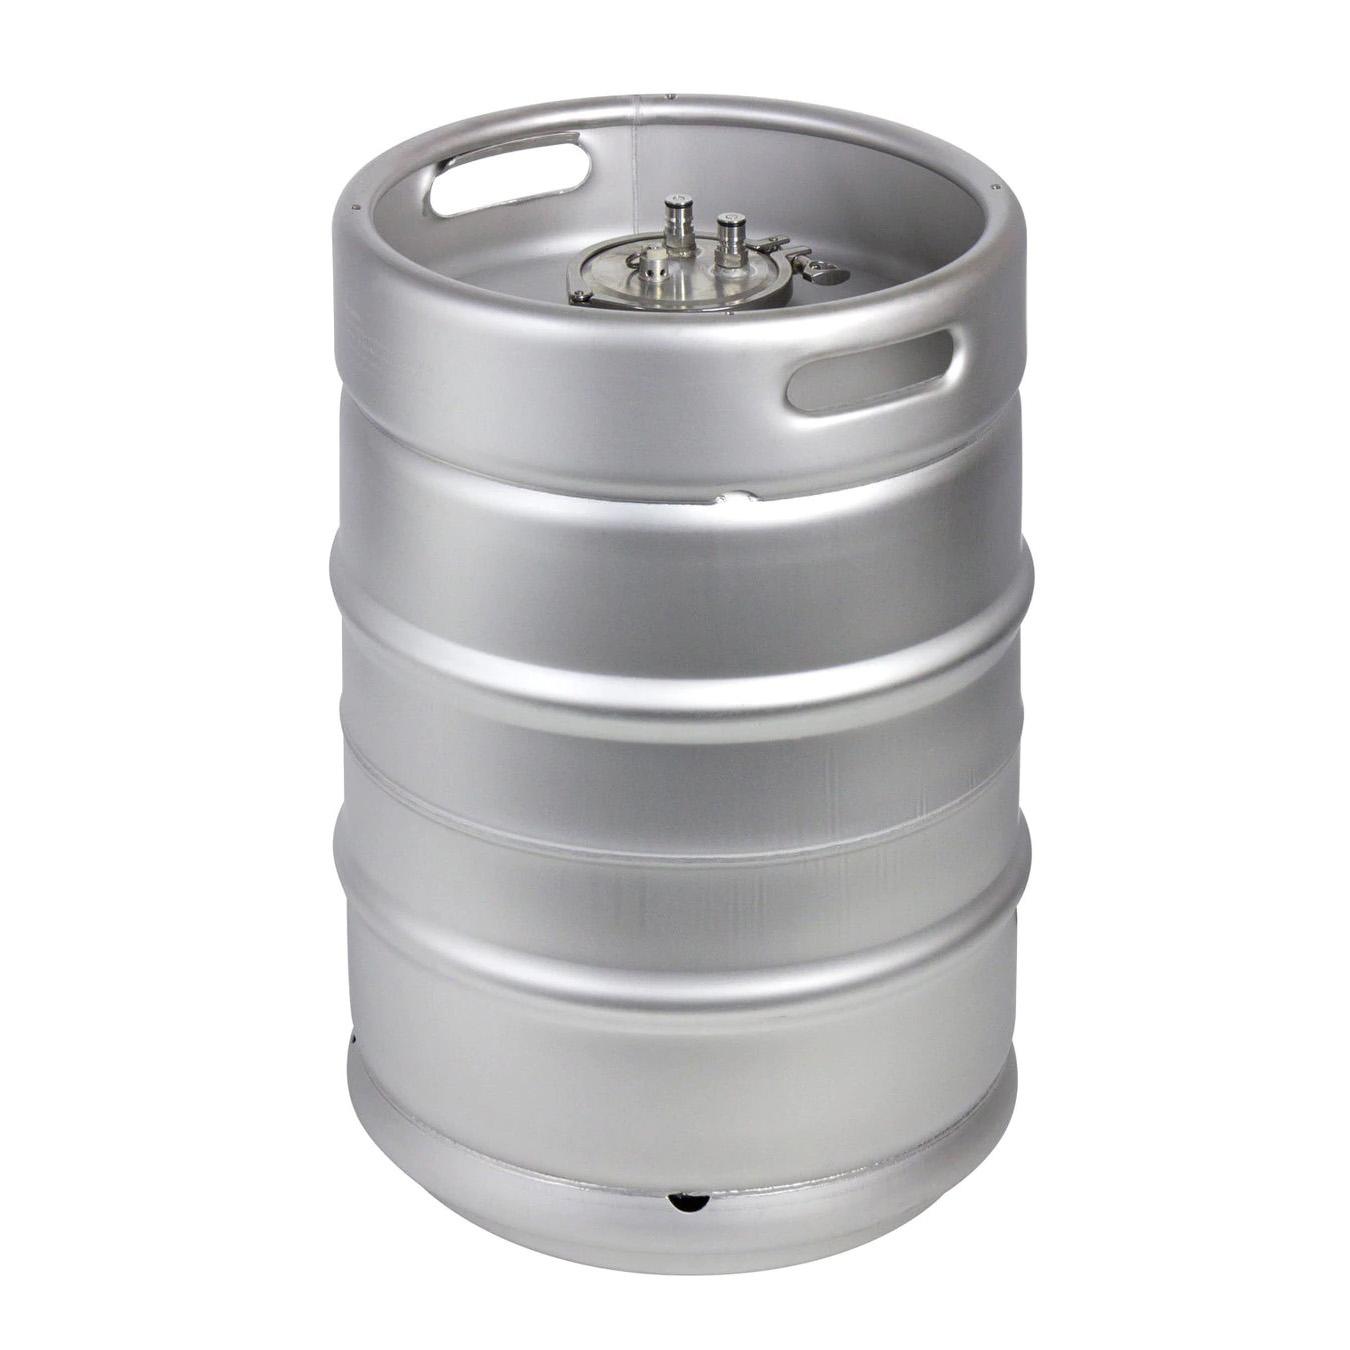 Coors Light Beer Keg